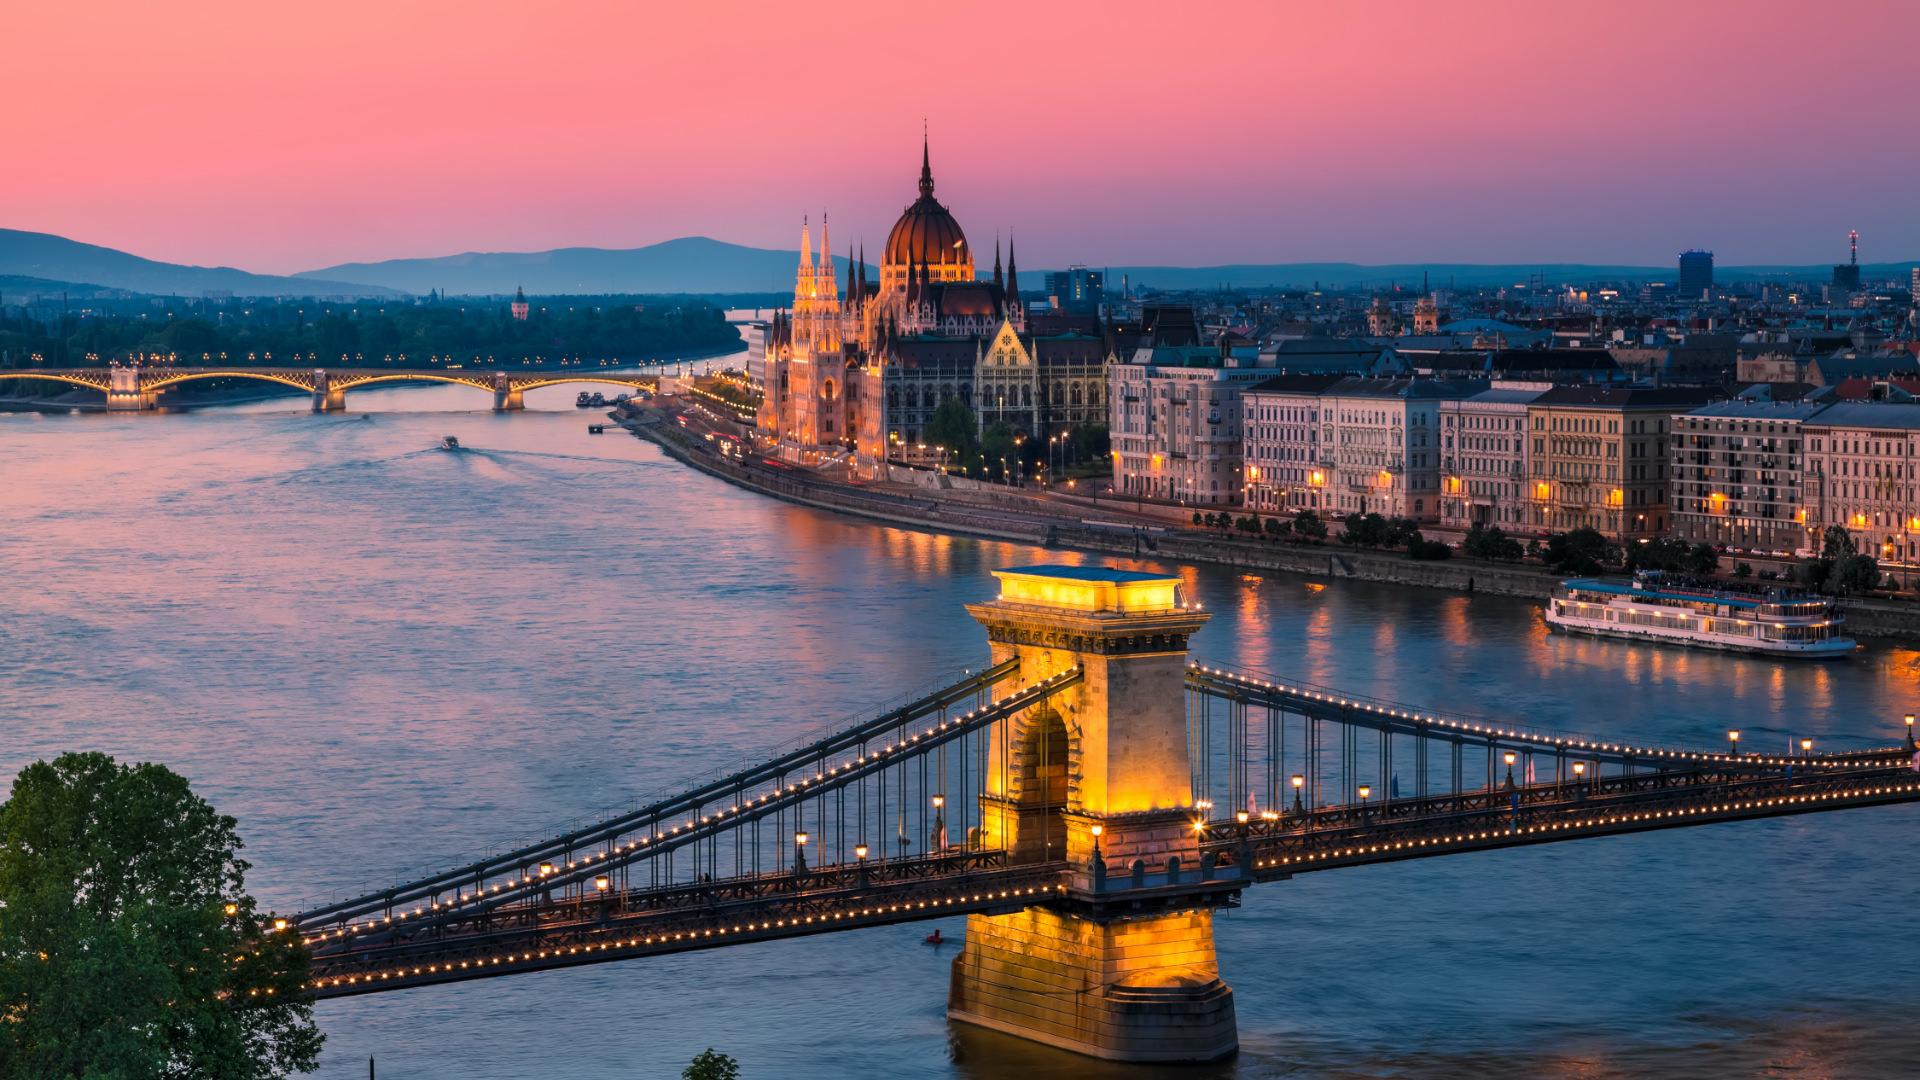 48 Saat Bir Şehir; Budapeşte